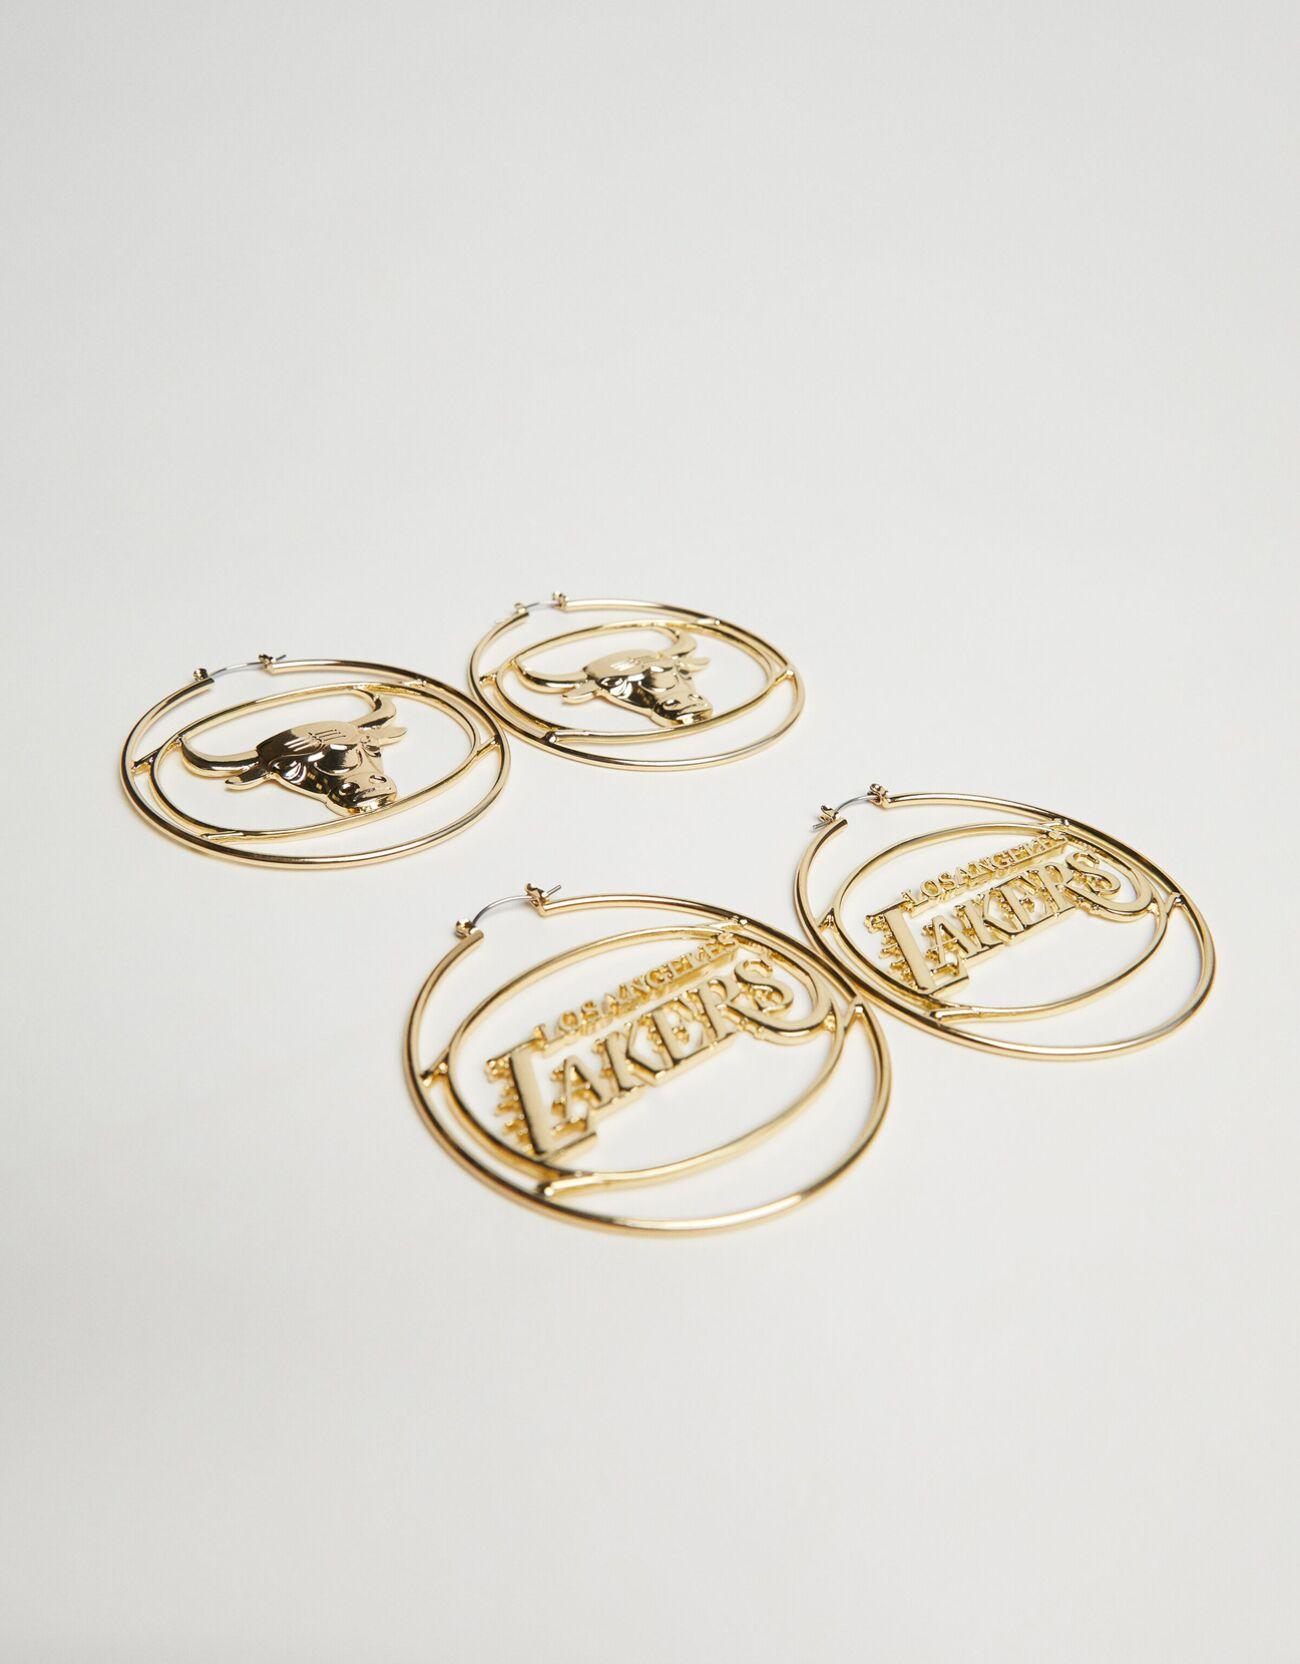 Bershka Set 2 Pendientes Nba + Bershka Mujer Oro